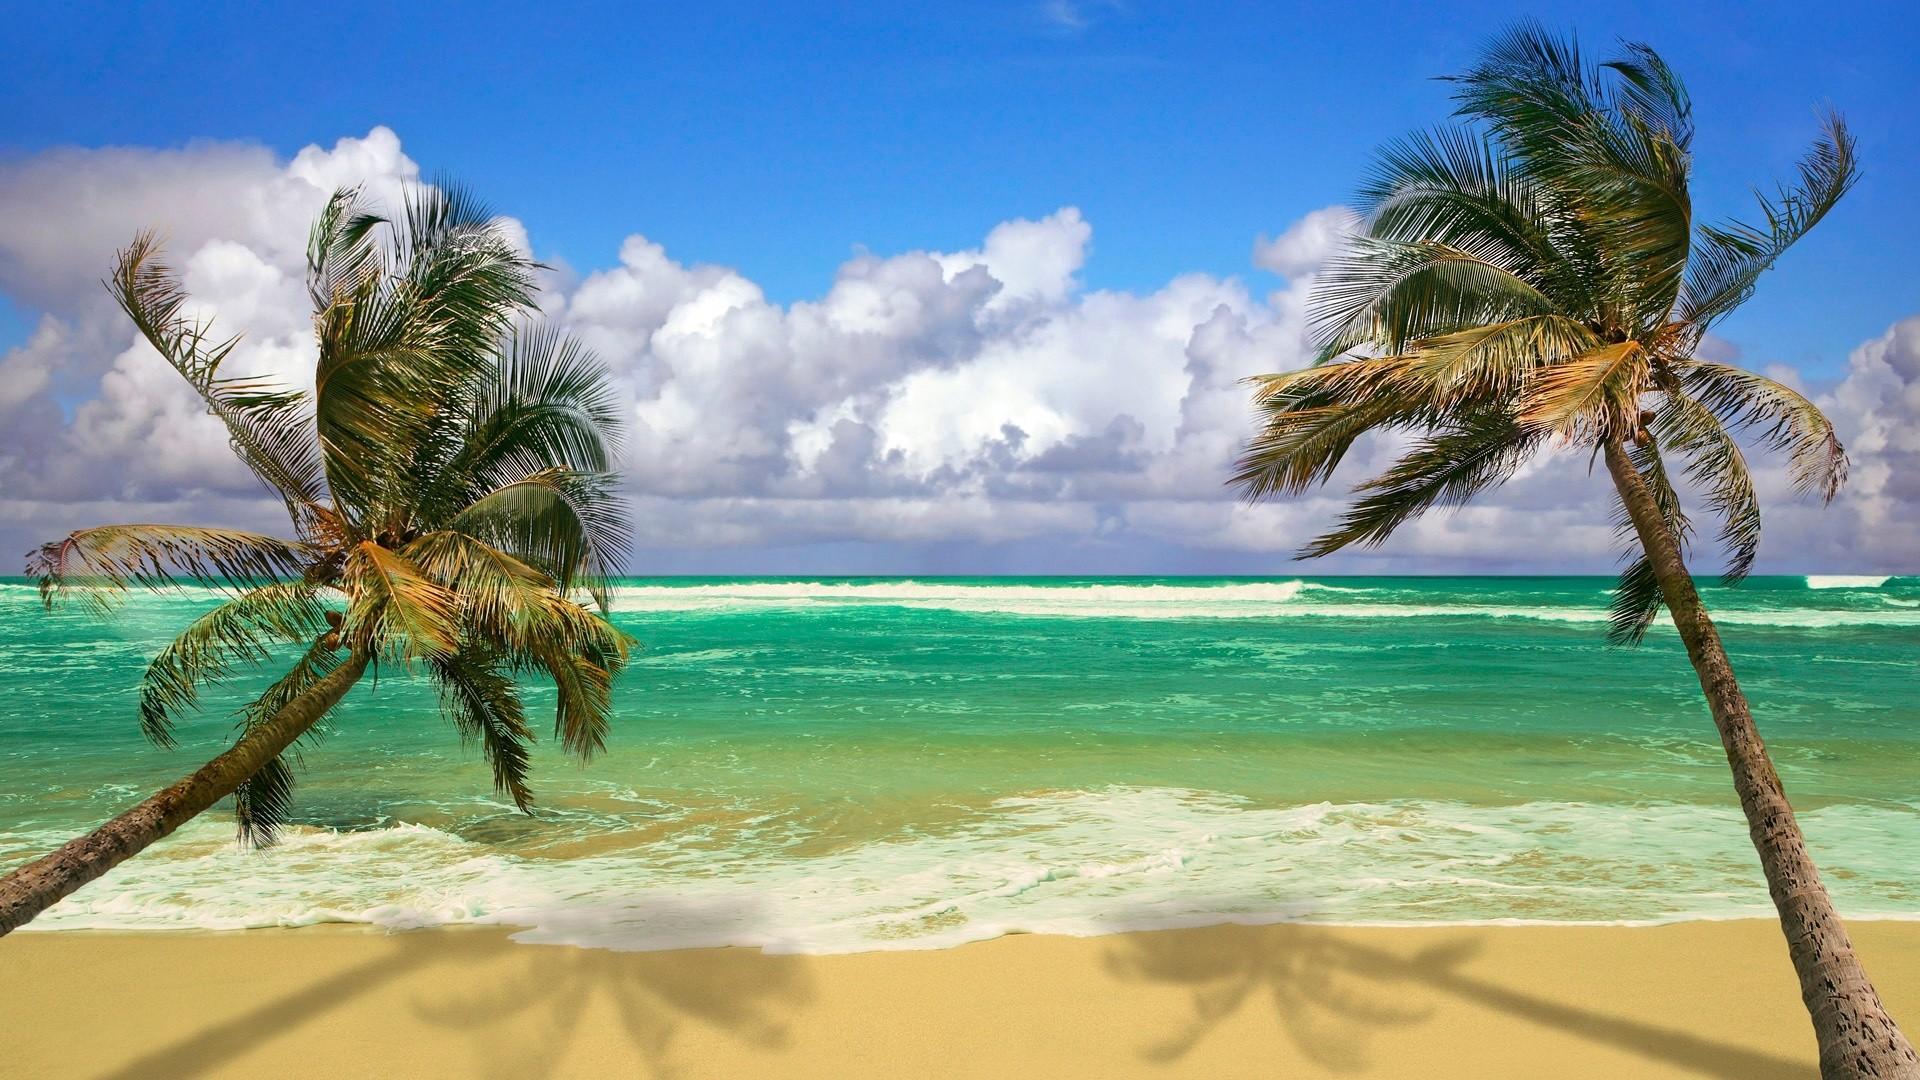 Res: 1920x1080, summer beach scene hd desktop wallpaper high definition. DOWNLOAD